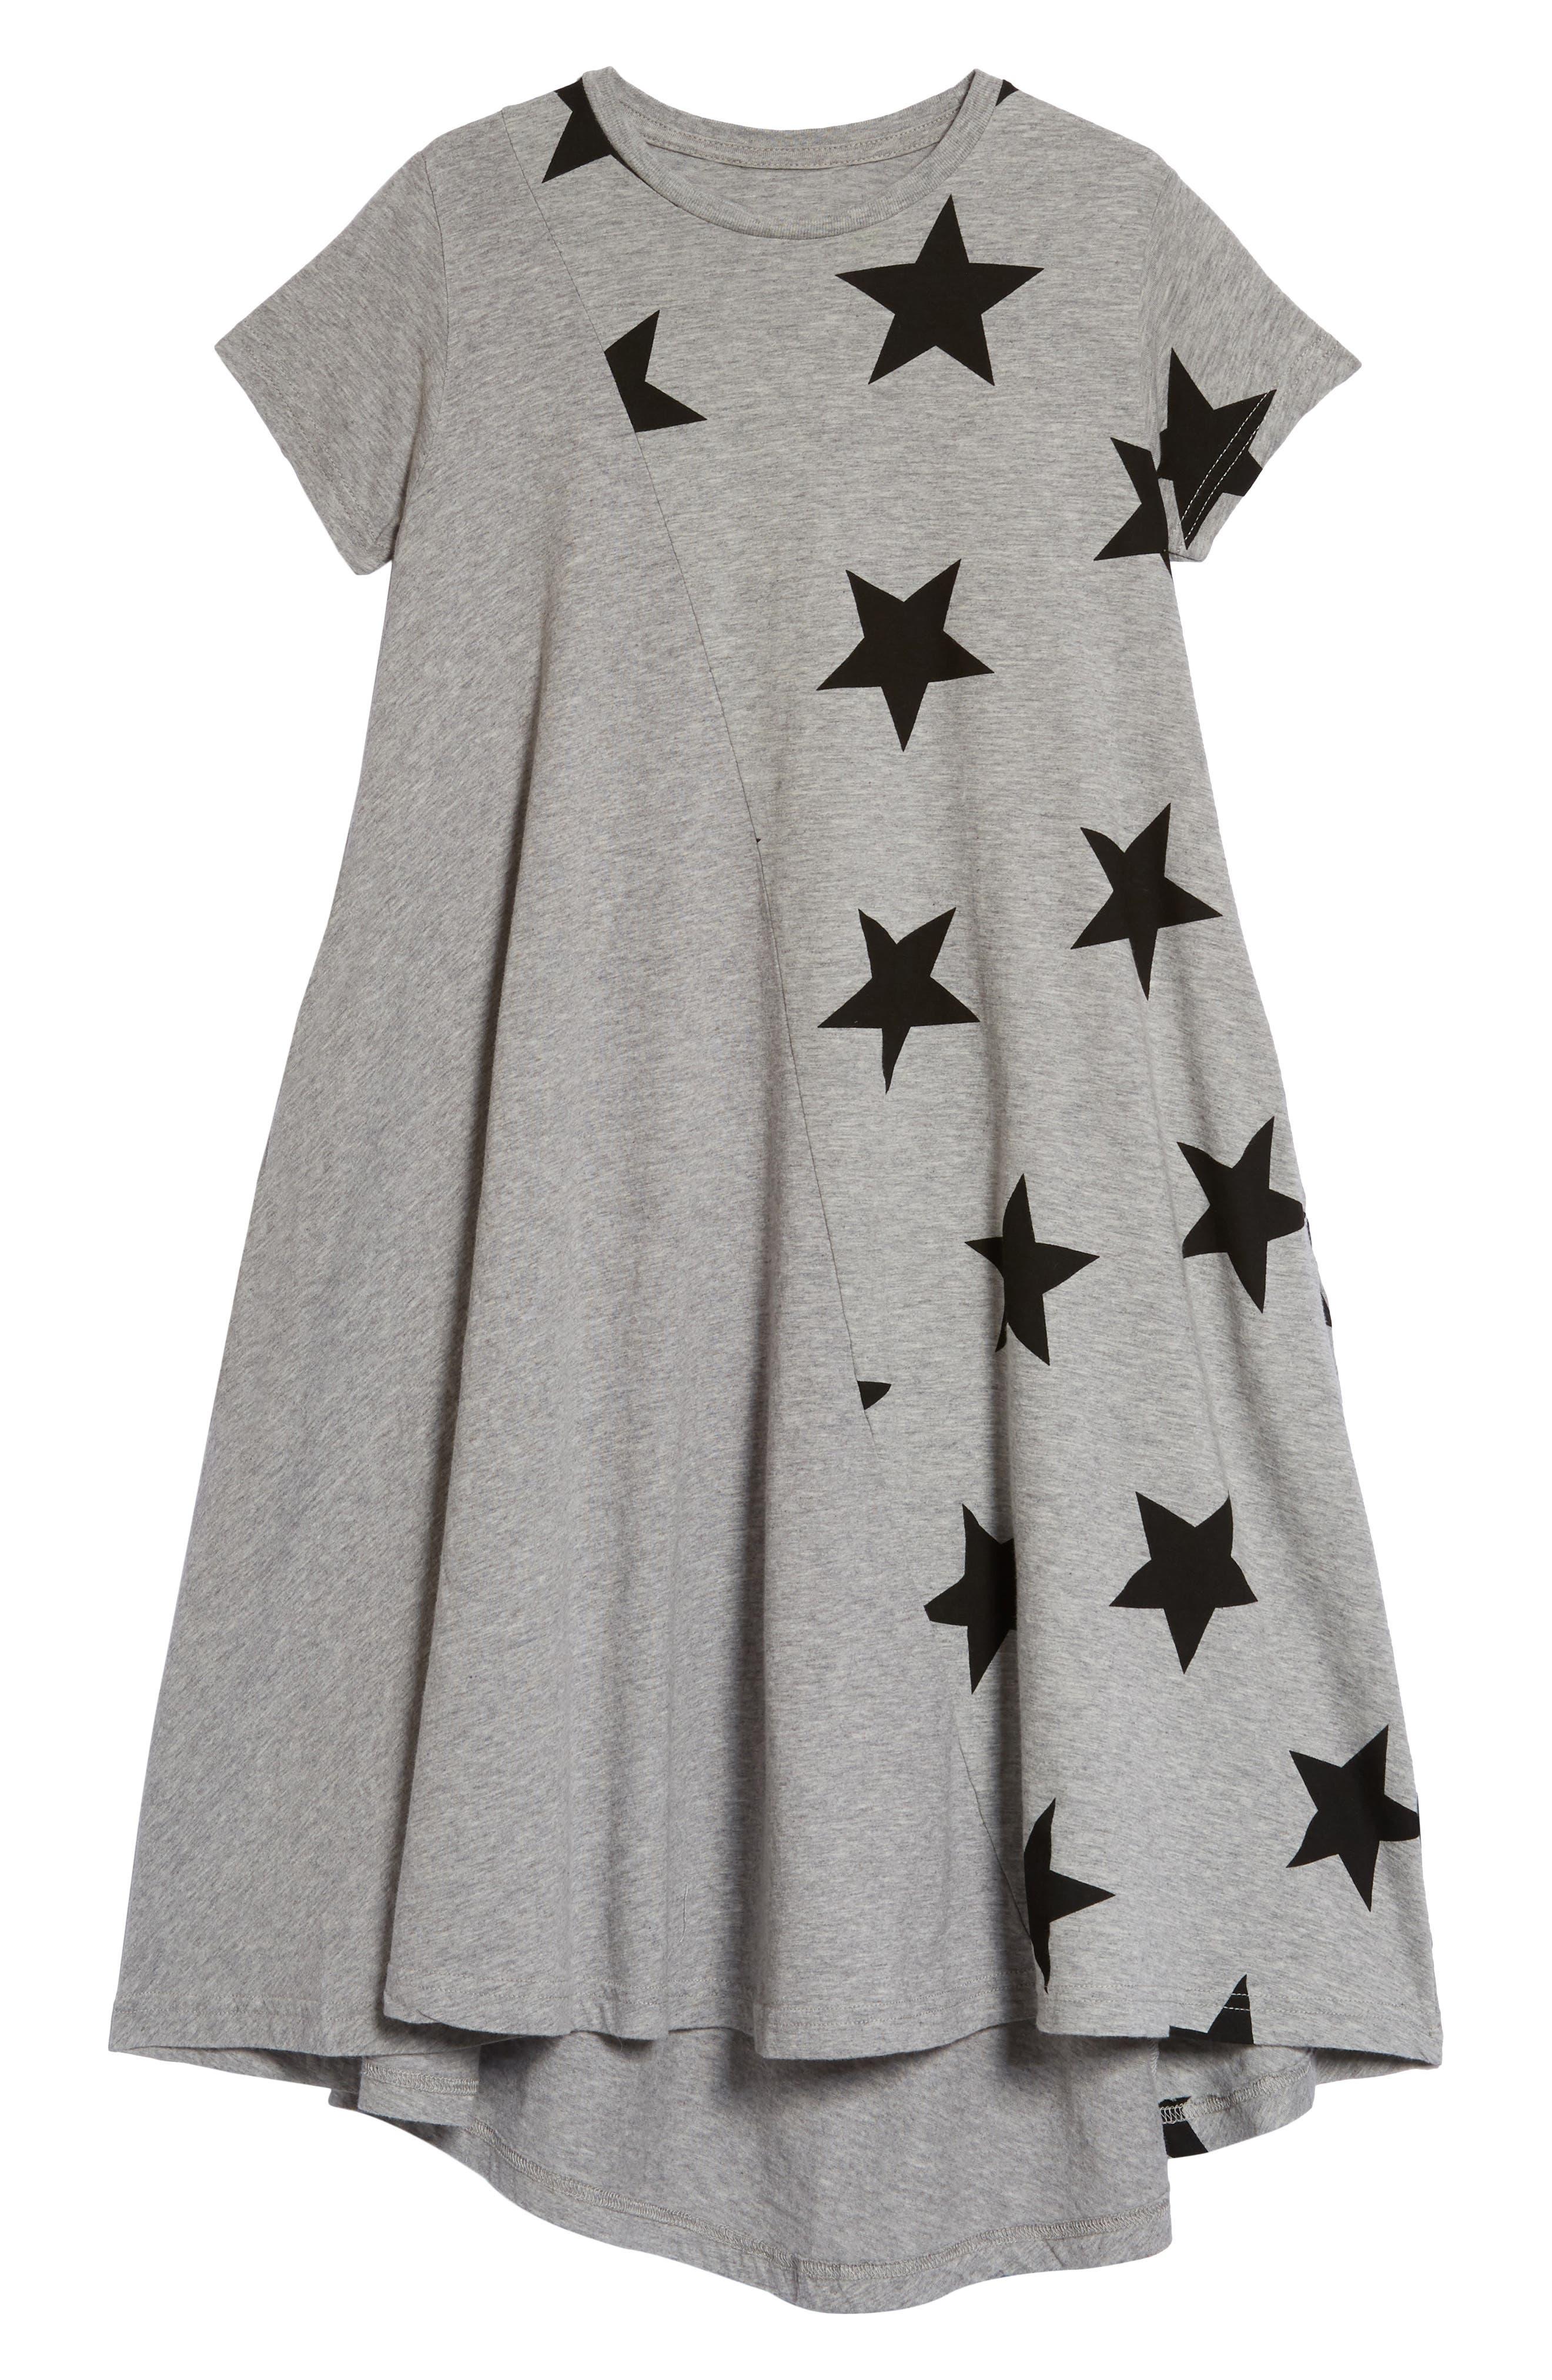 360 Star Print Dress,                         Main,                         color, Heather Grey